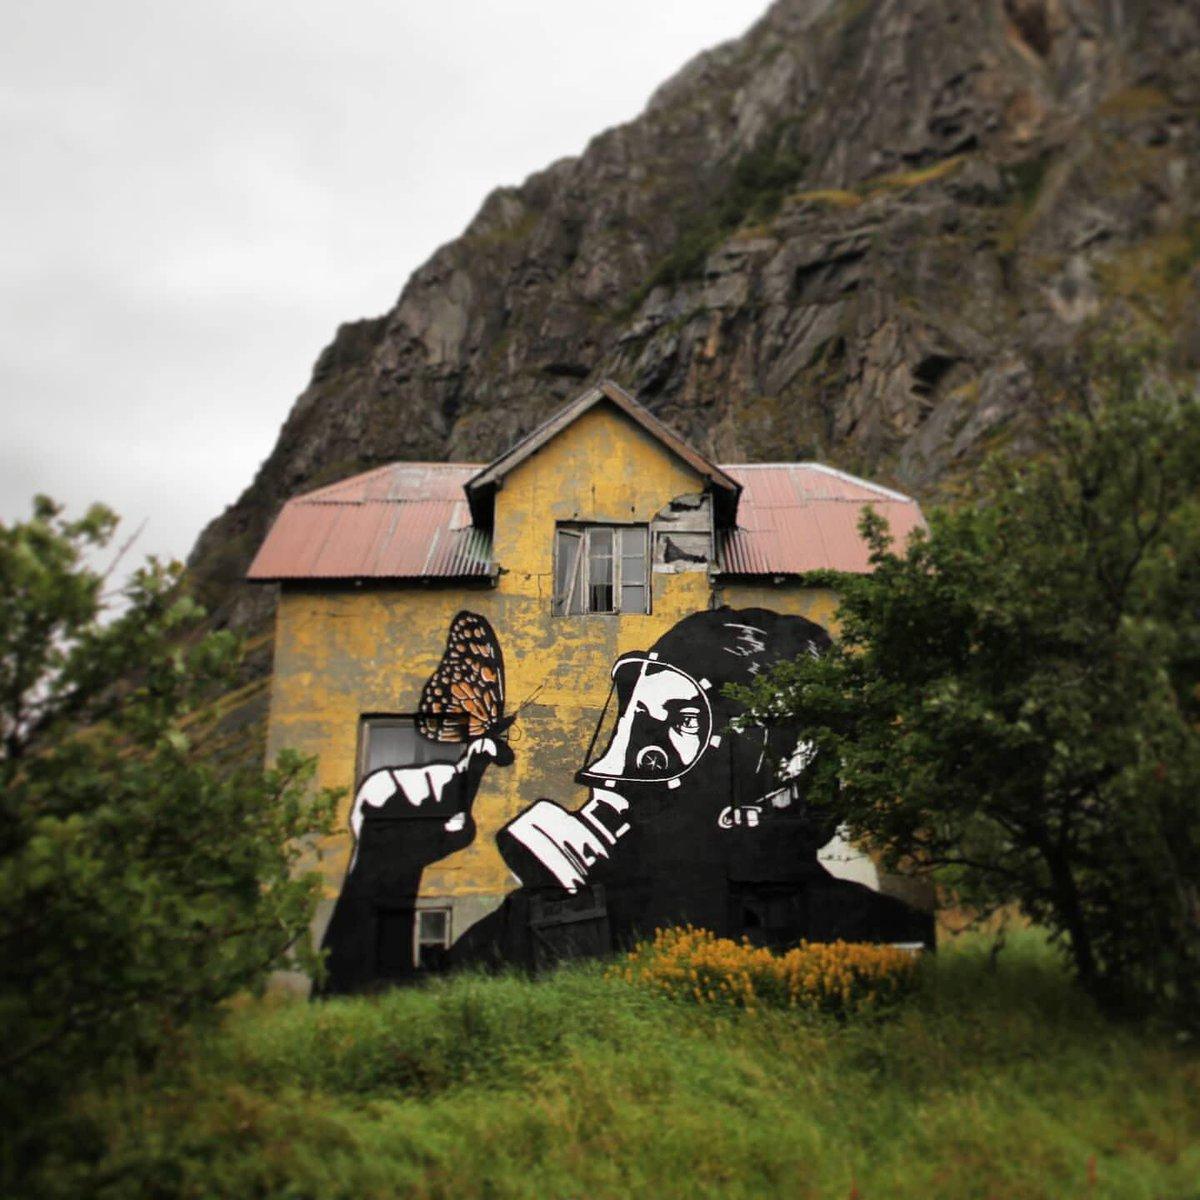 ... beauty is the only salvation, look for it always and everywhere. Art by Pøbel in Lofoten, Norway #StreetArt #Art #beauty #Butterfly #Coronavirus #Salvation #Graffiti #Mural #UrbanArtpic.twitter.com/2BMXjhX6Ha